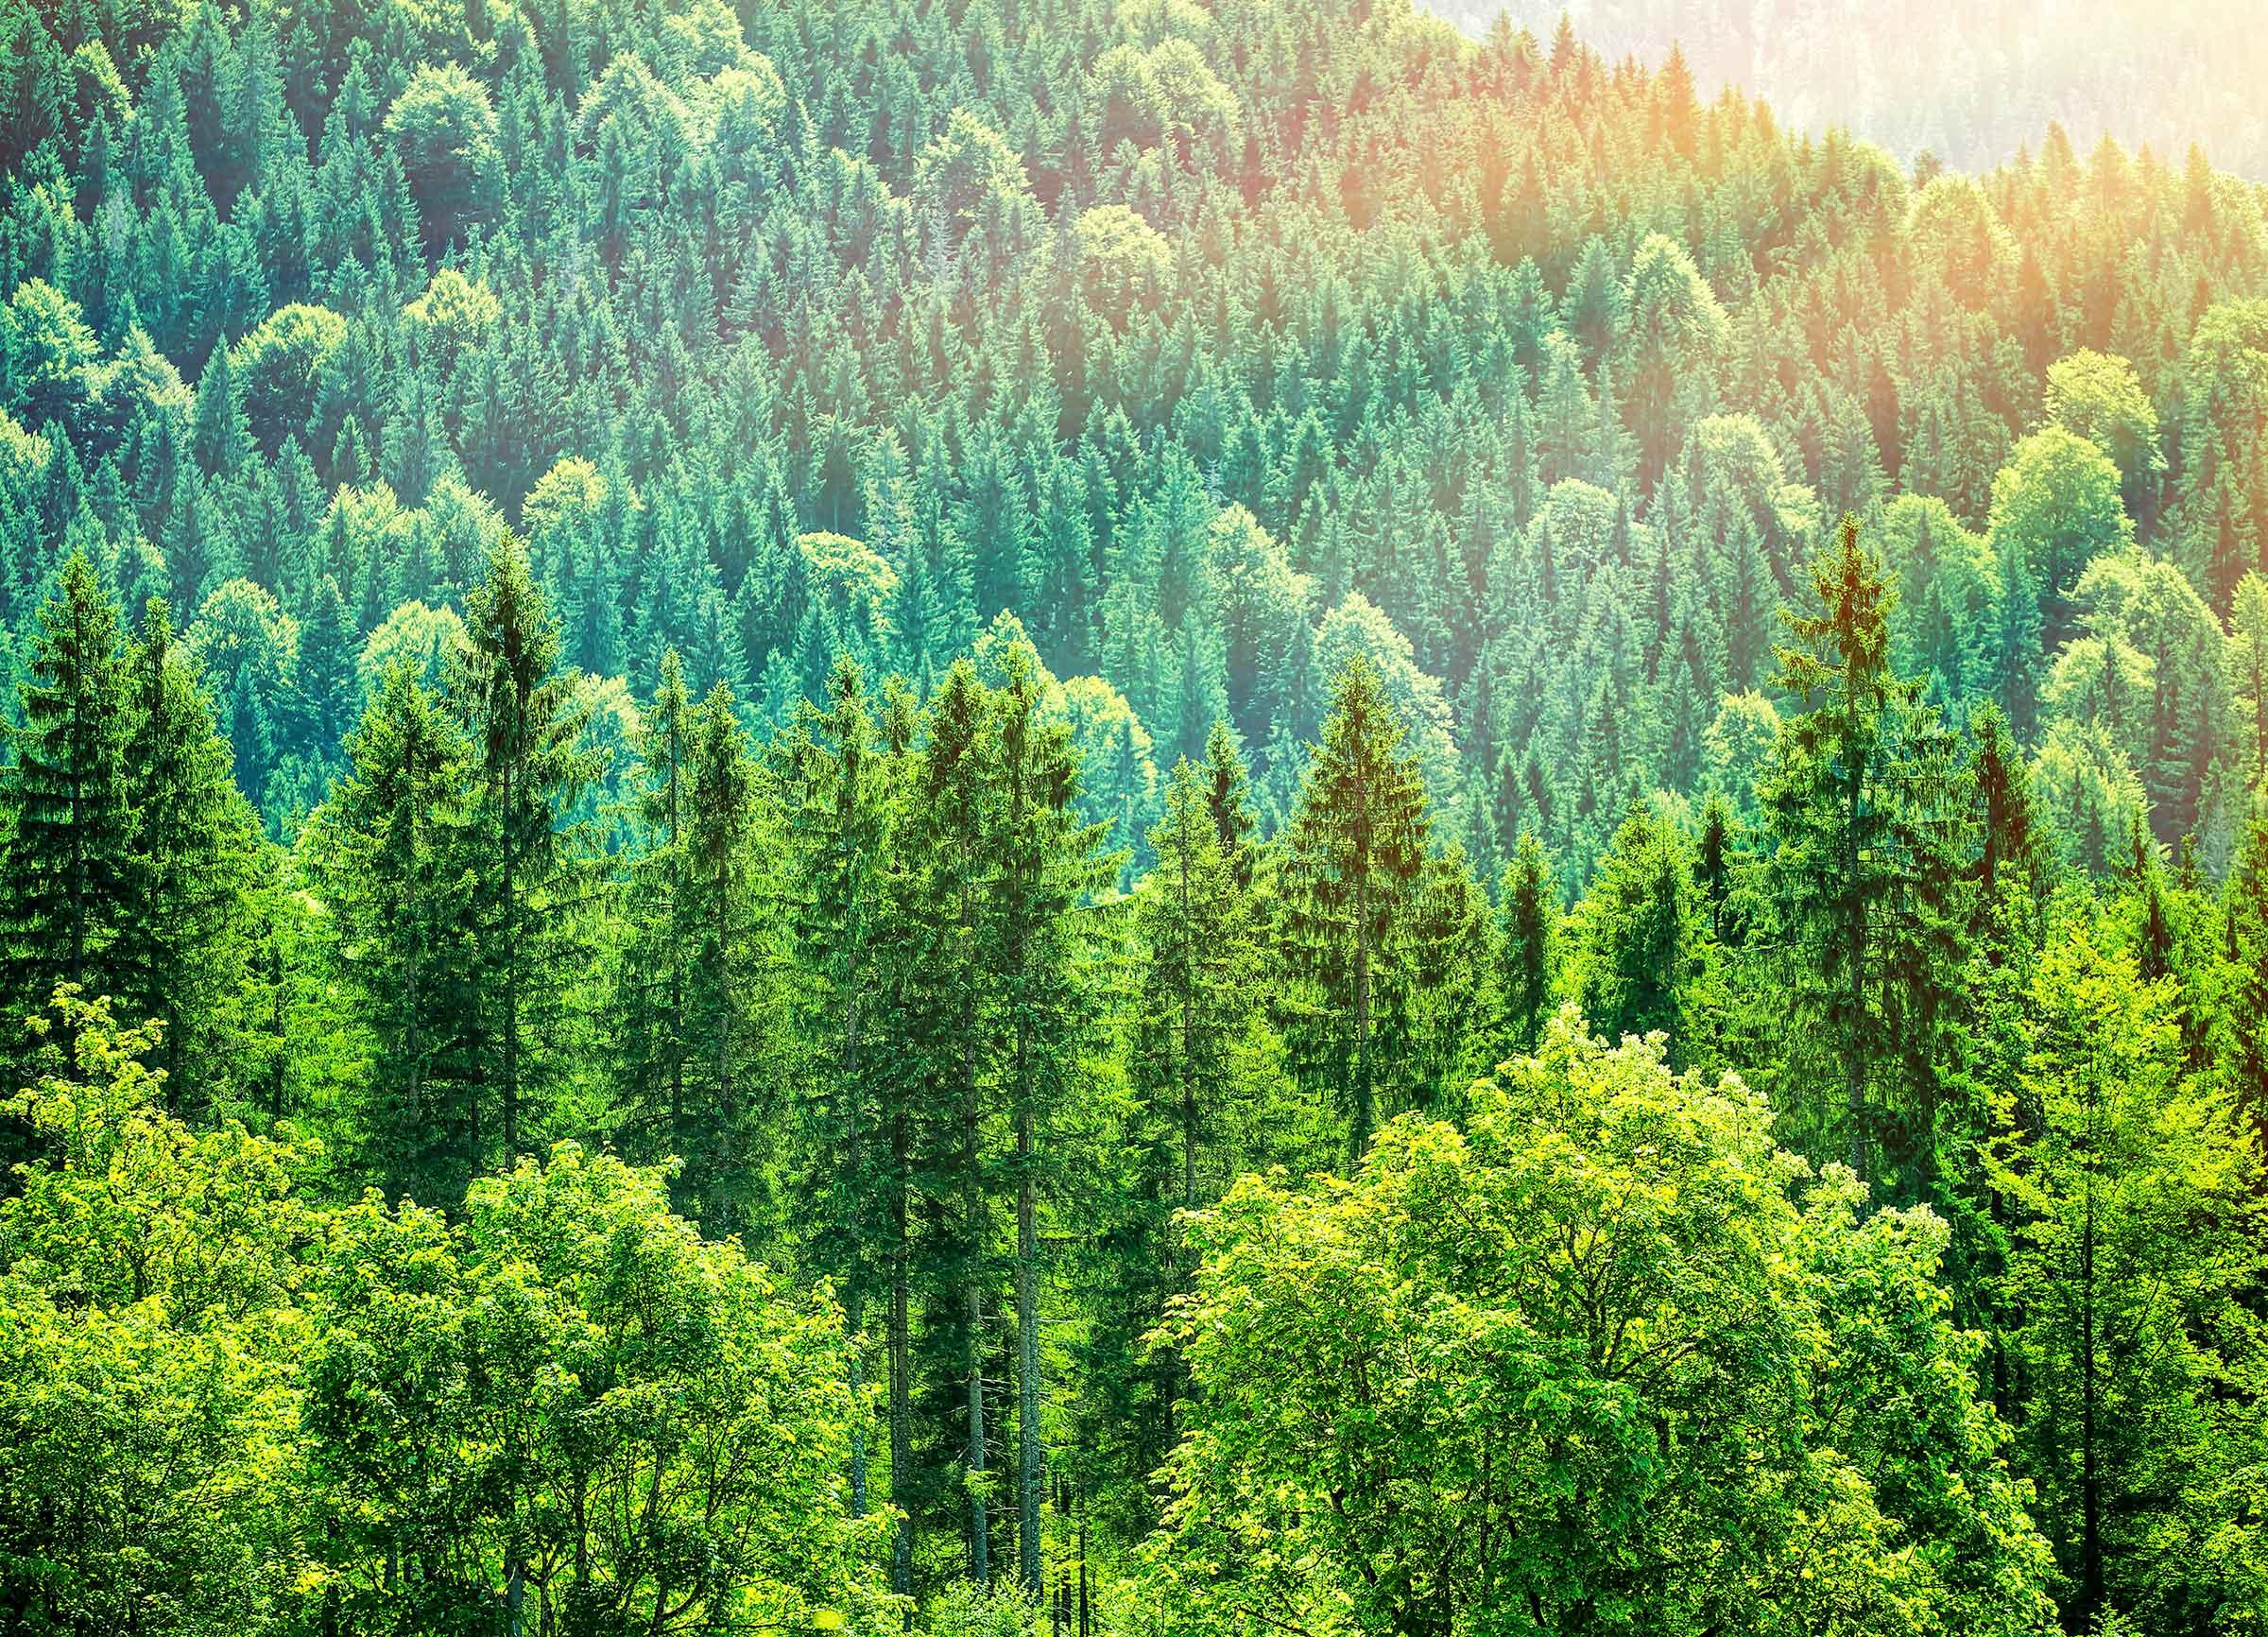 Pine woods in Europe